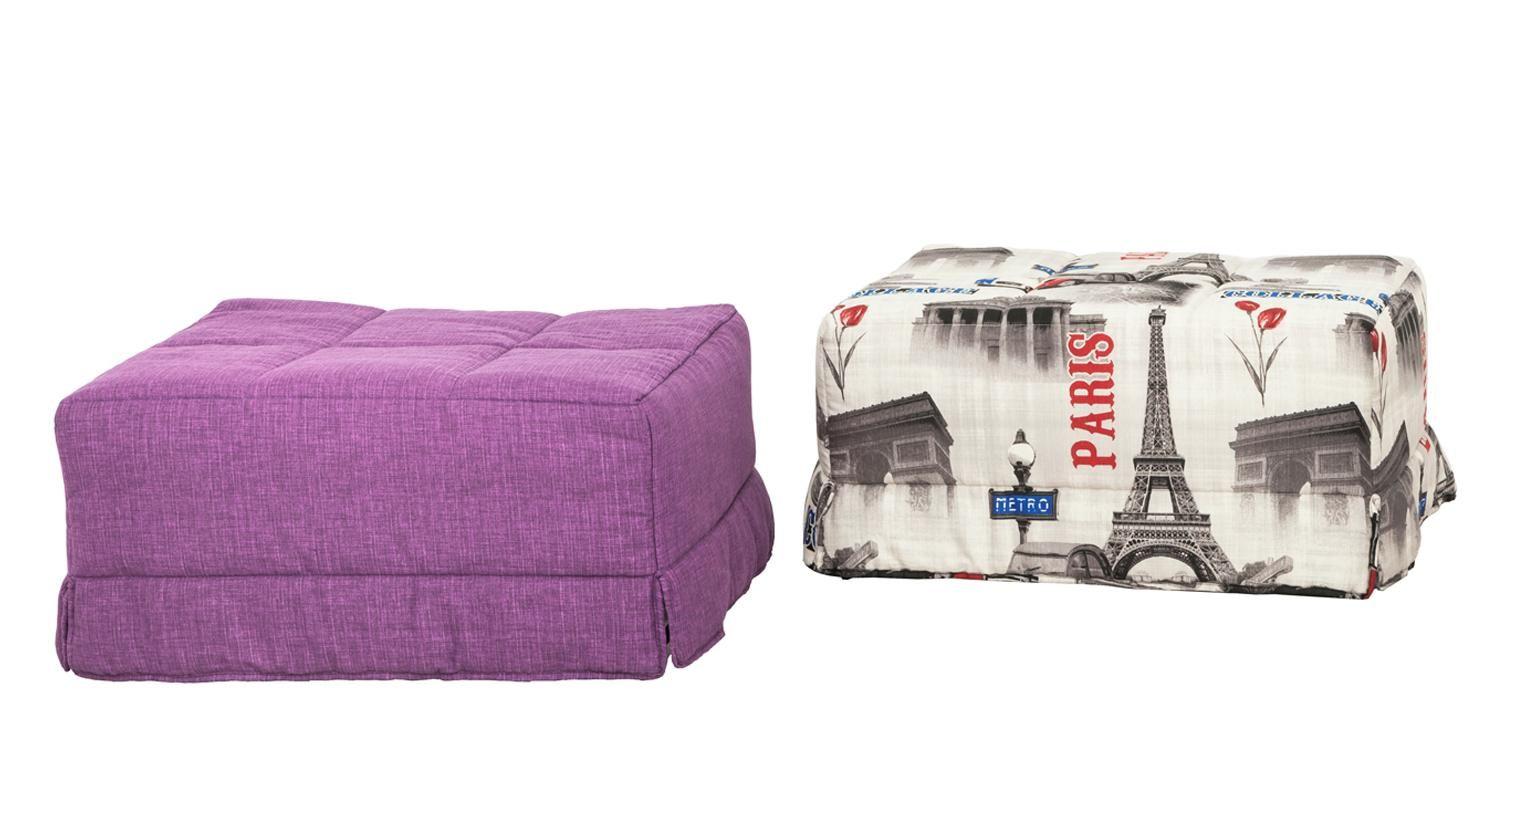 Comprar puff confort puff cama 80x180 loneta levante for Cama 80x180